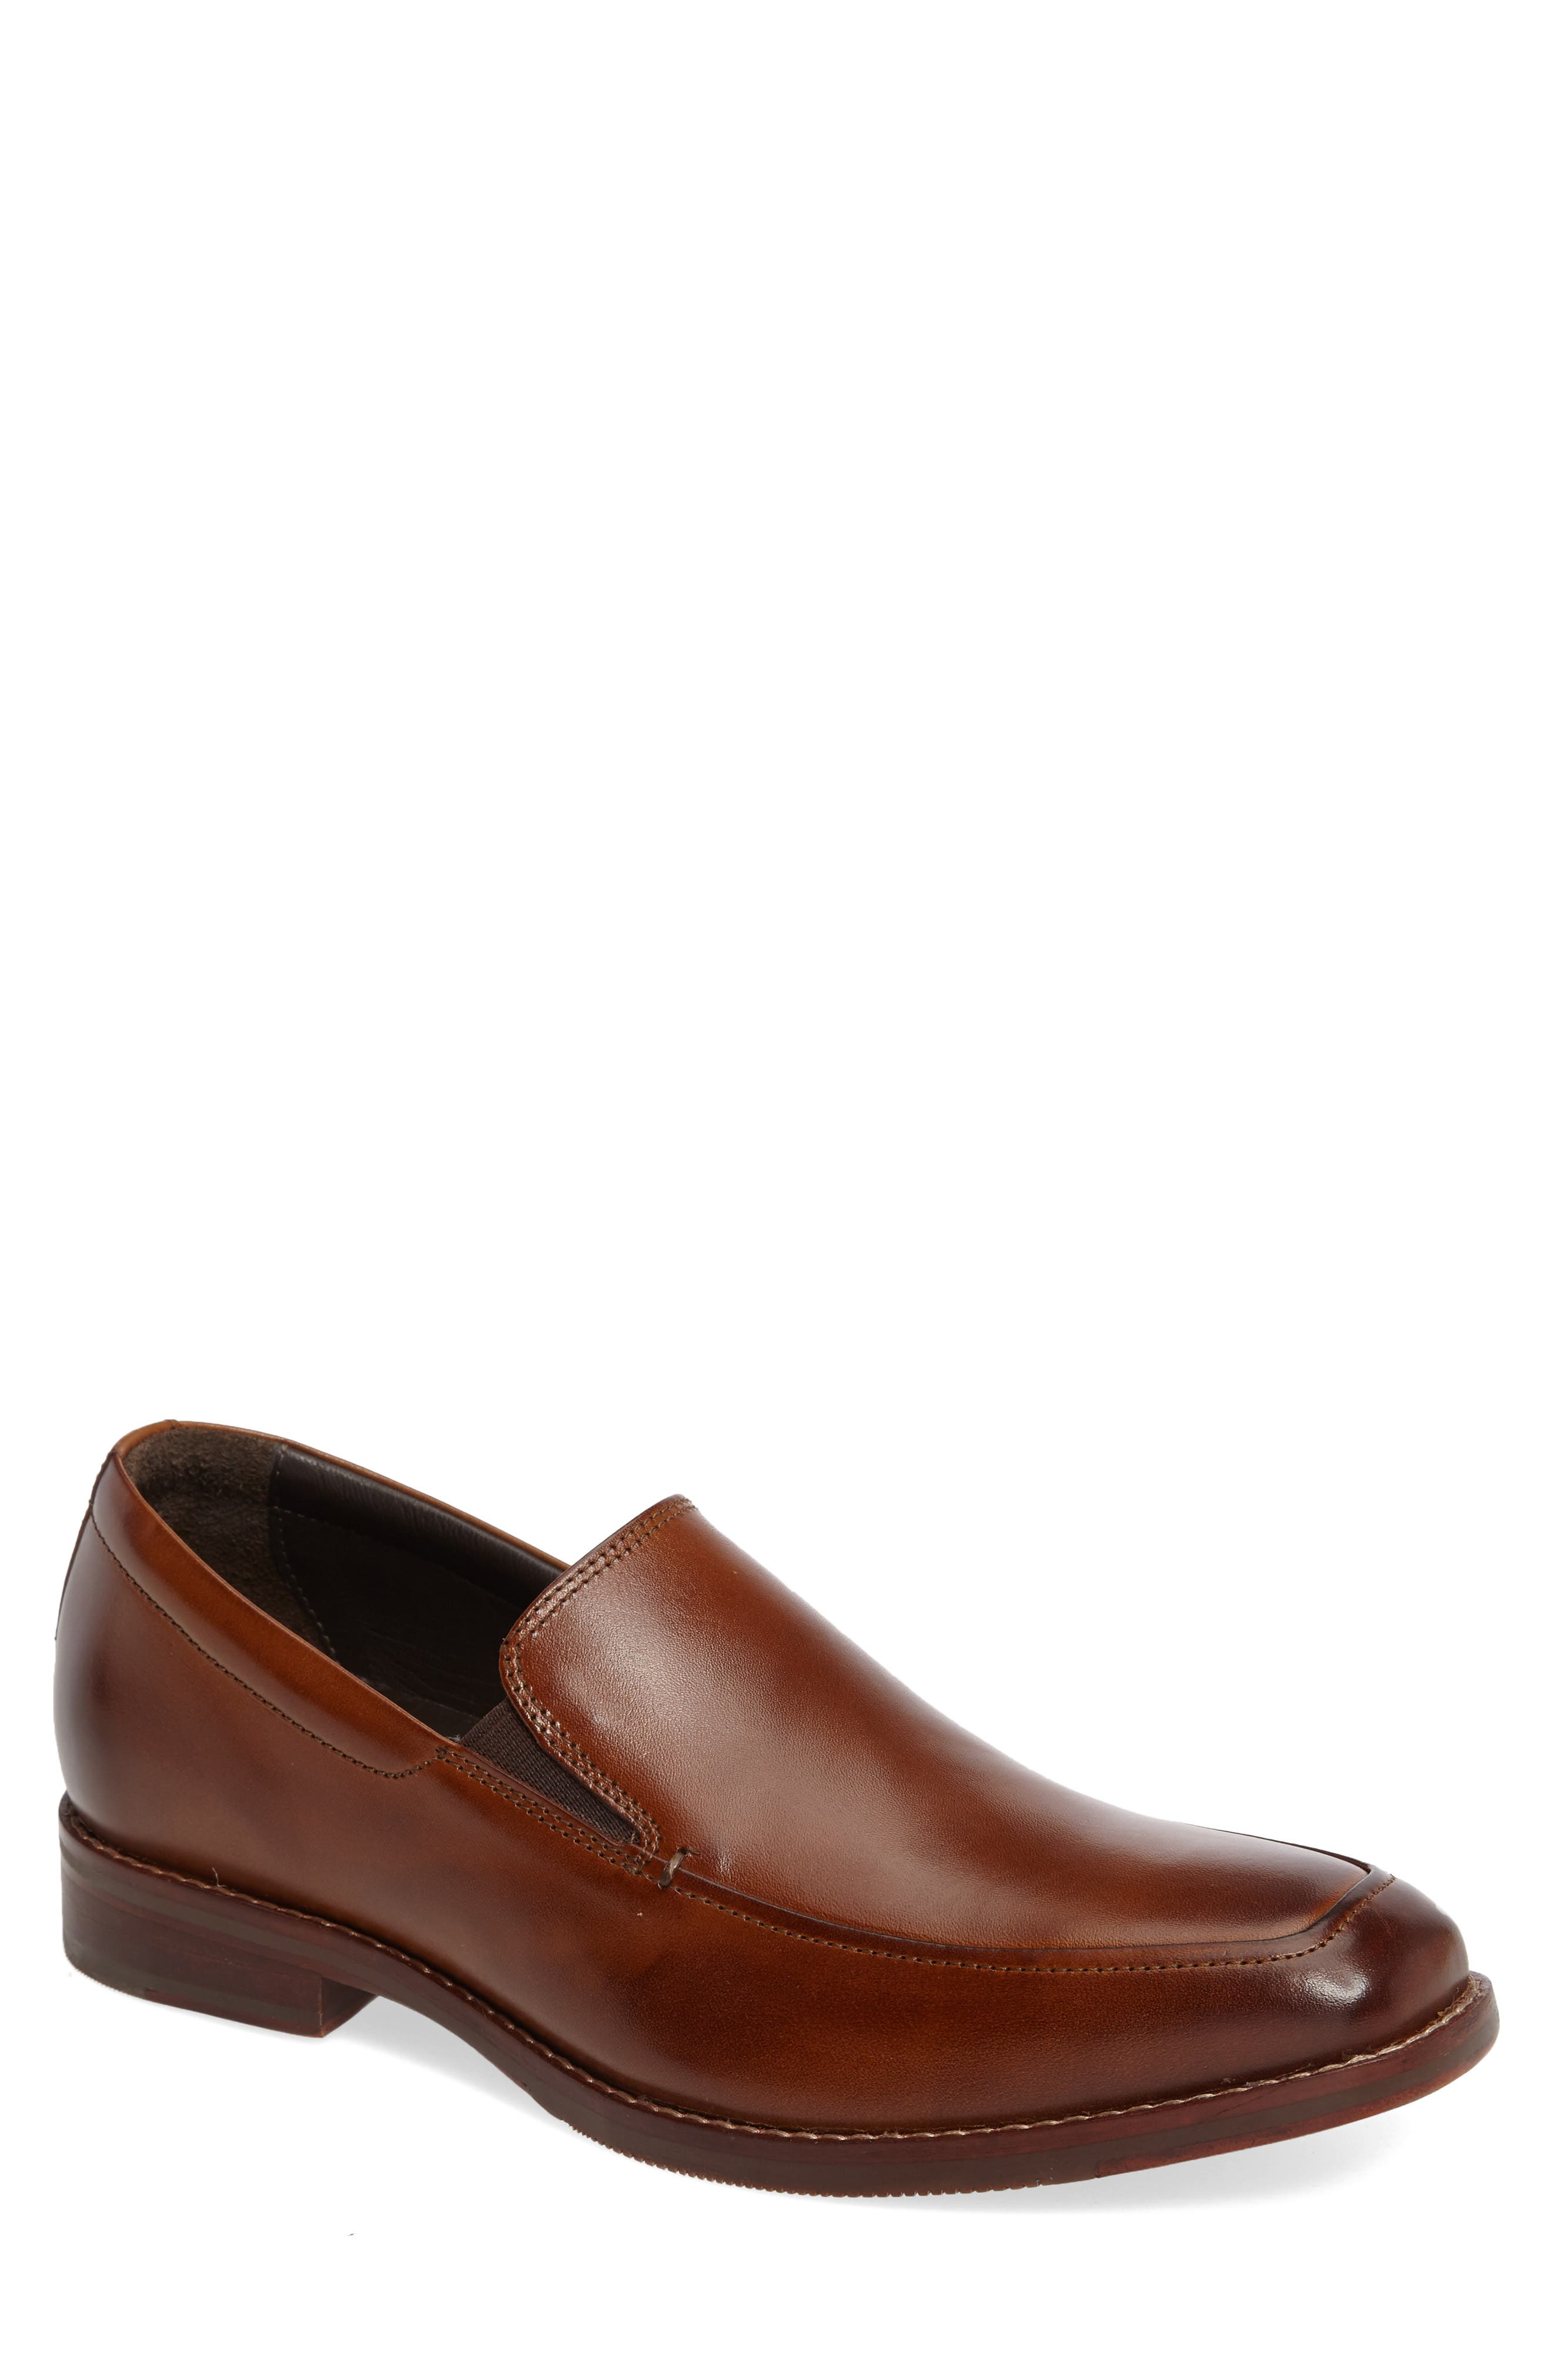 J&M 1850 Meritt Venetian Loafer (Men) (Nordstrom Exclusive)